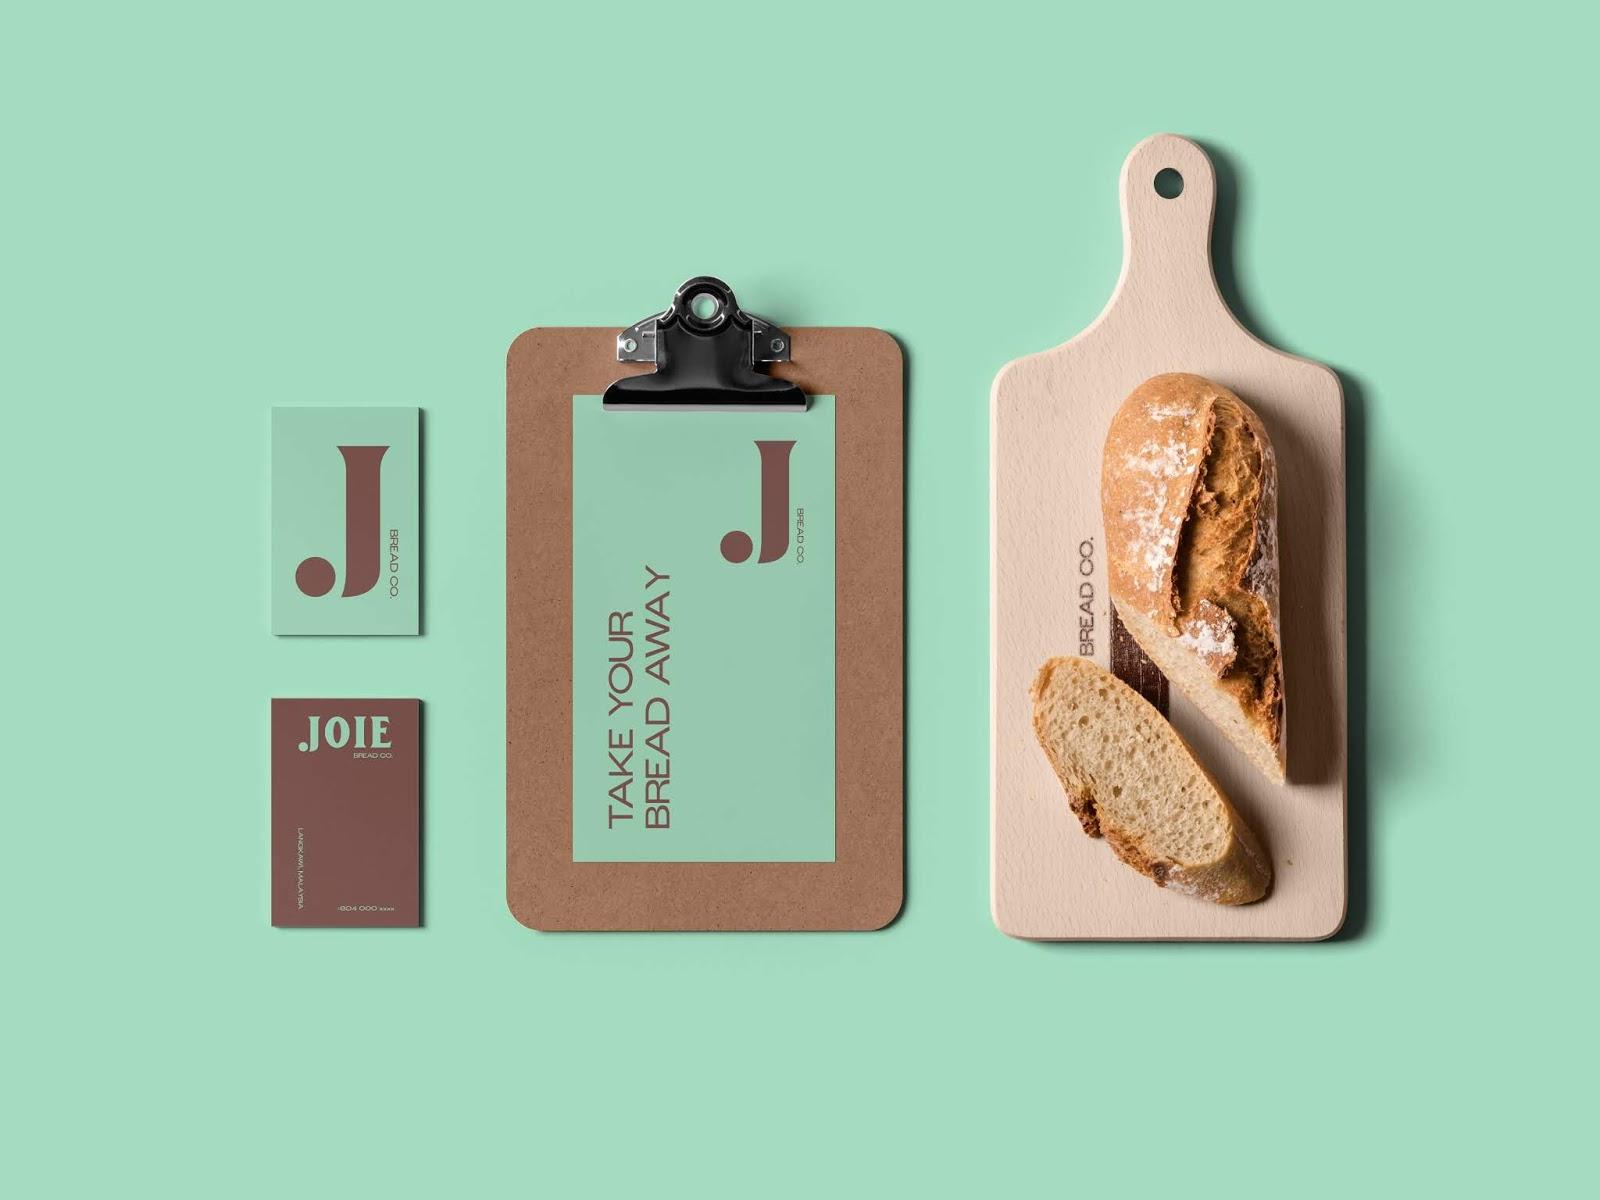 Joie-店铺策划1